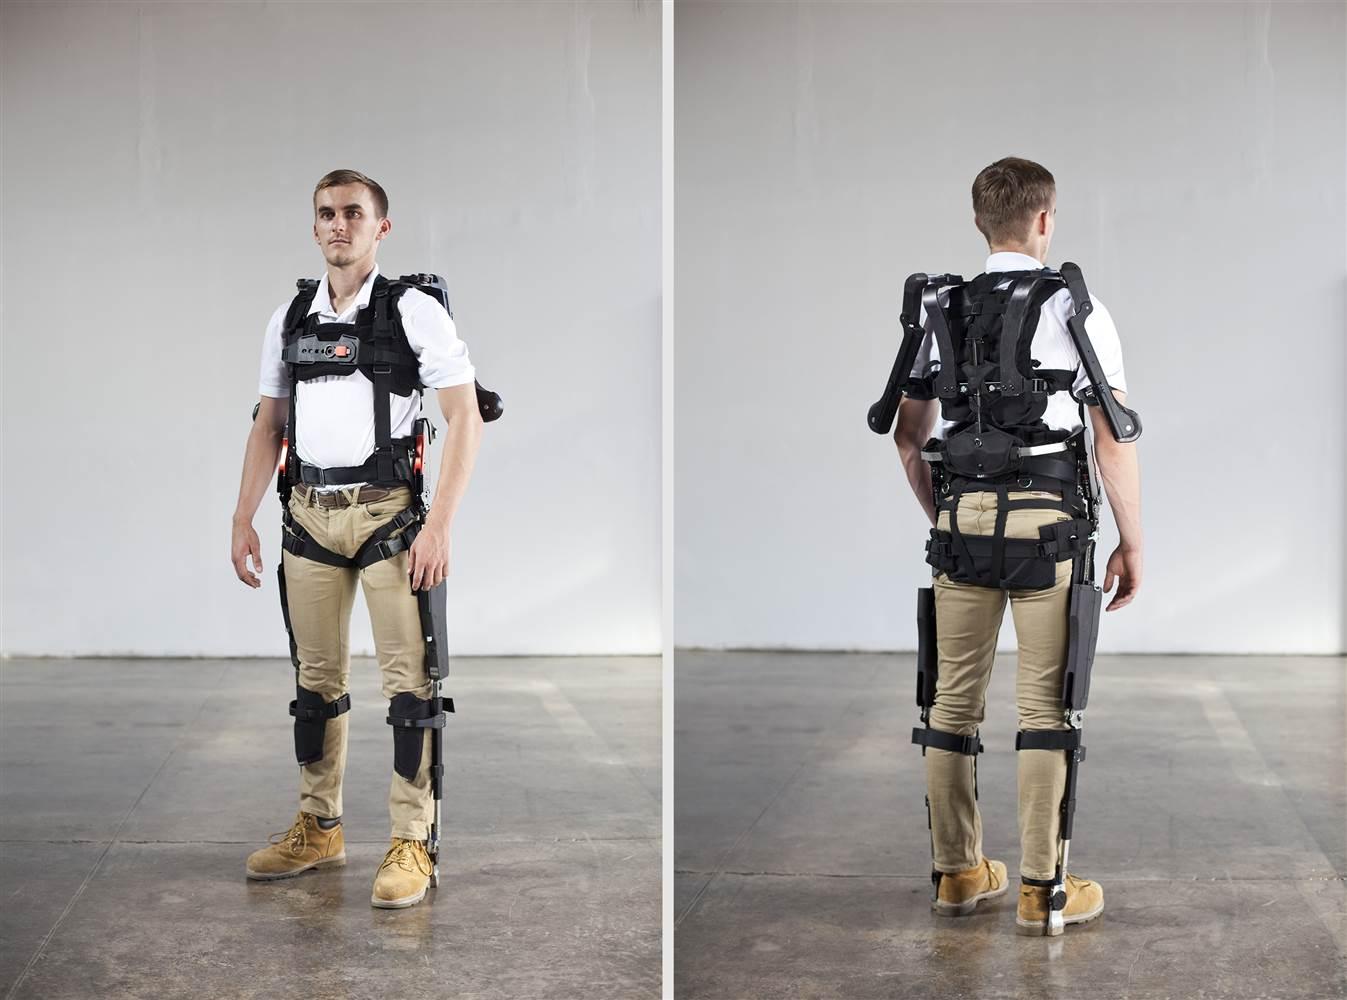 170217-exoskeleton-mn-1810_4dd2c55b55e6a2f68a53ba767777cf04-nbcnews-ux-2880-1000